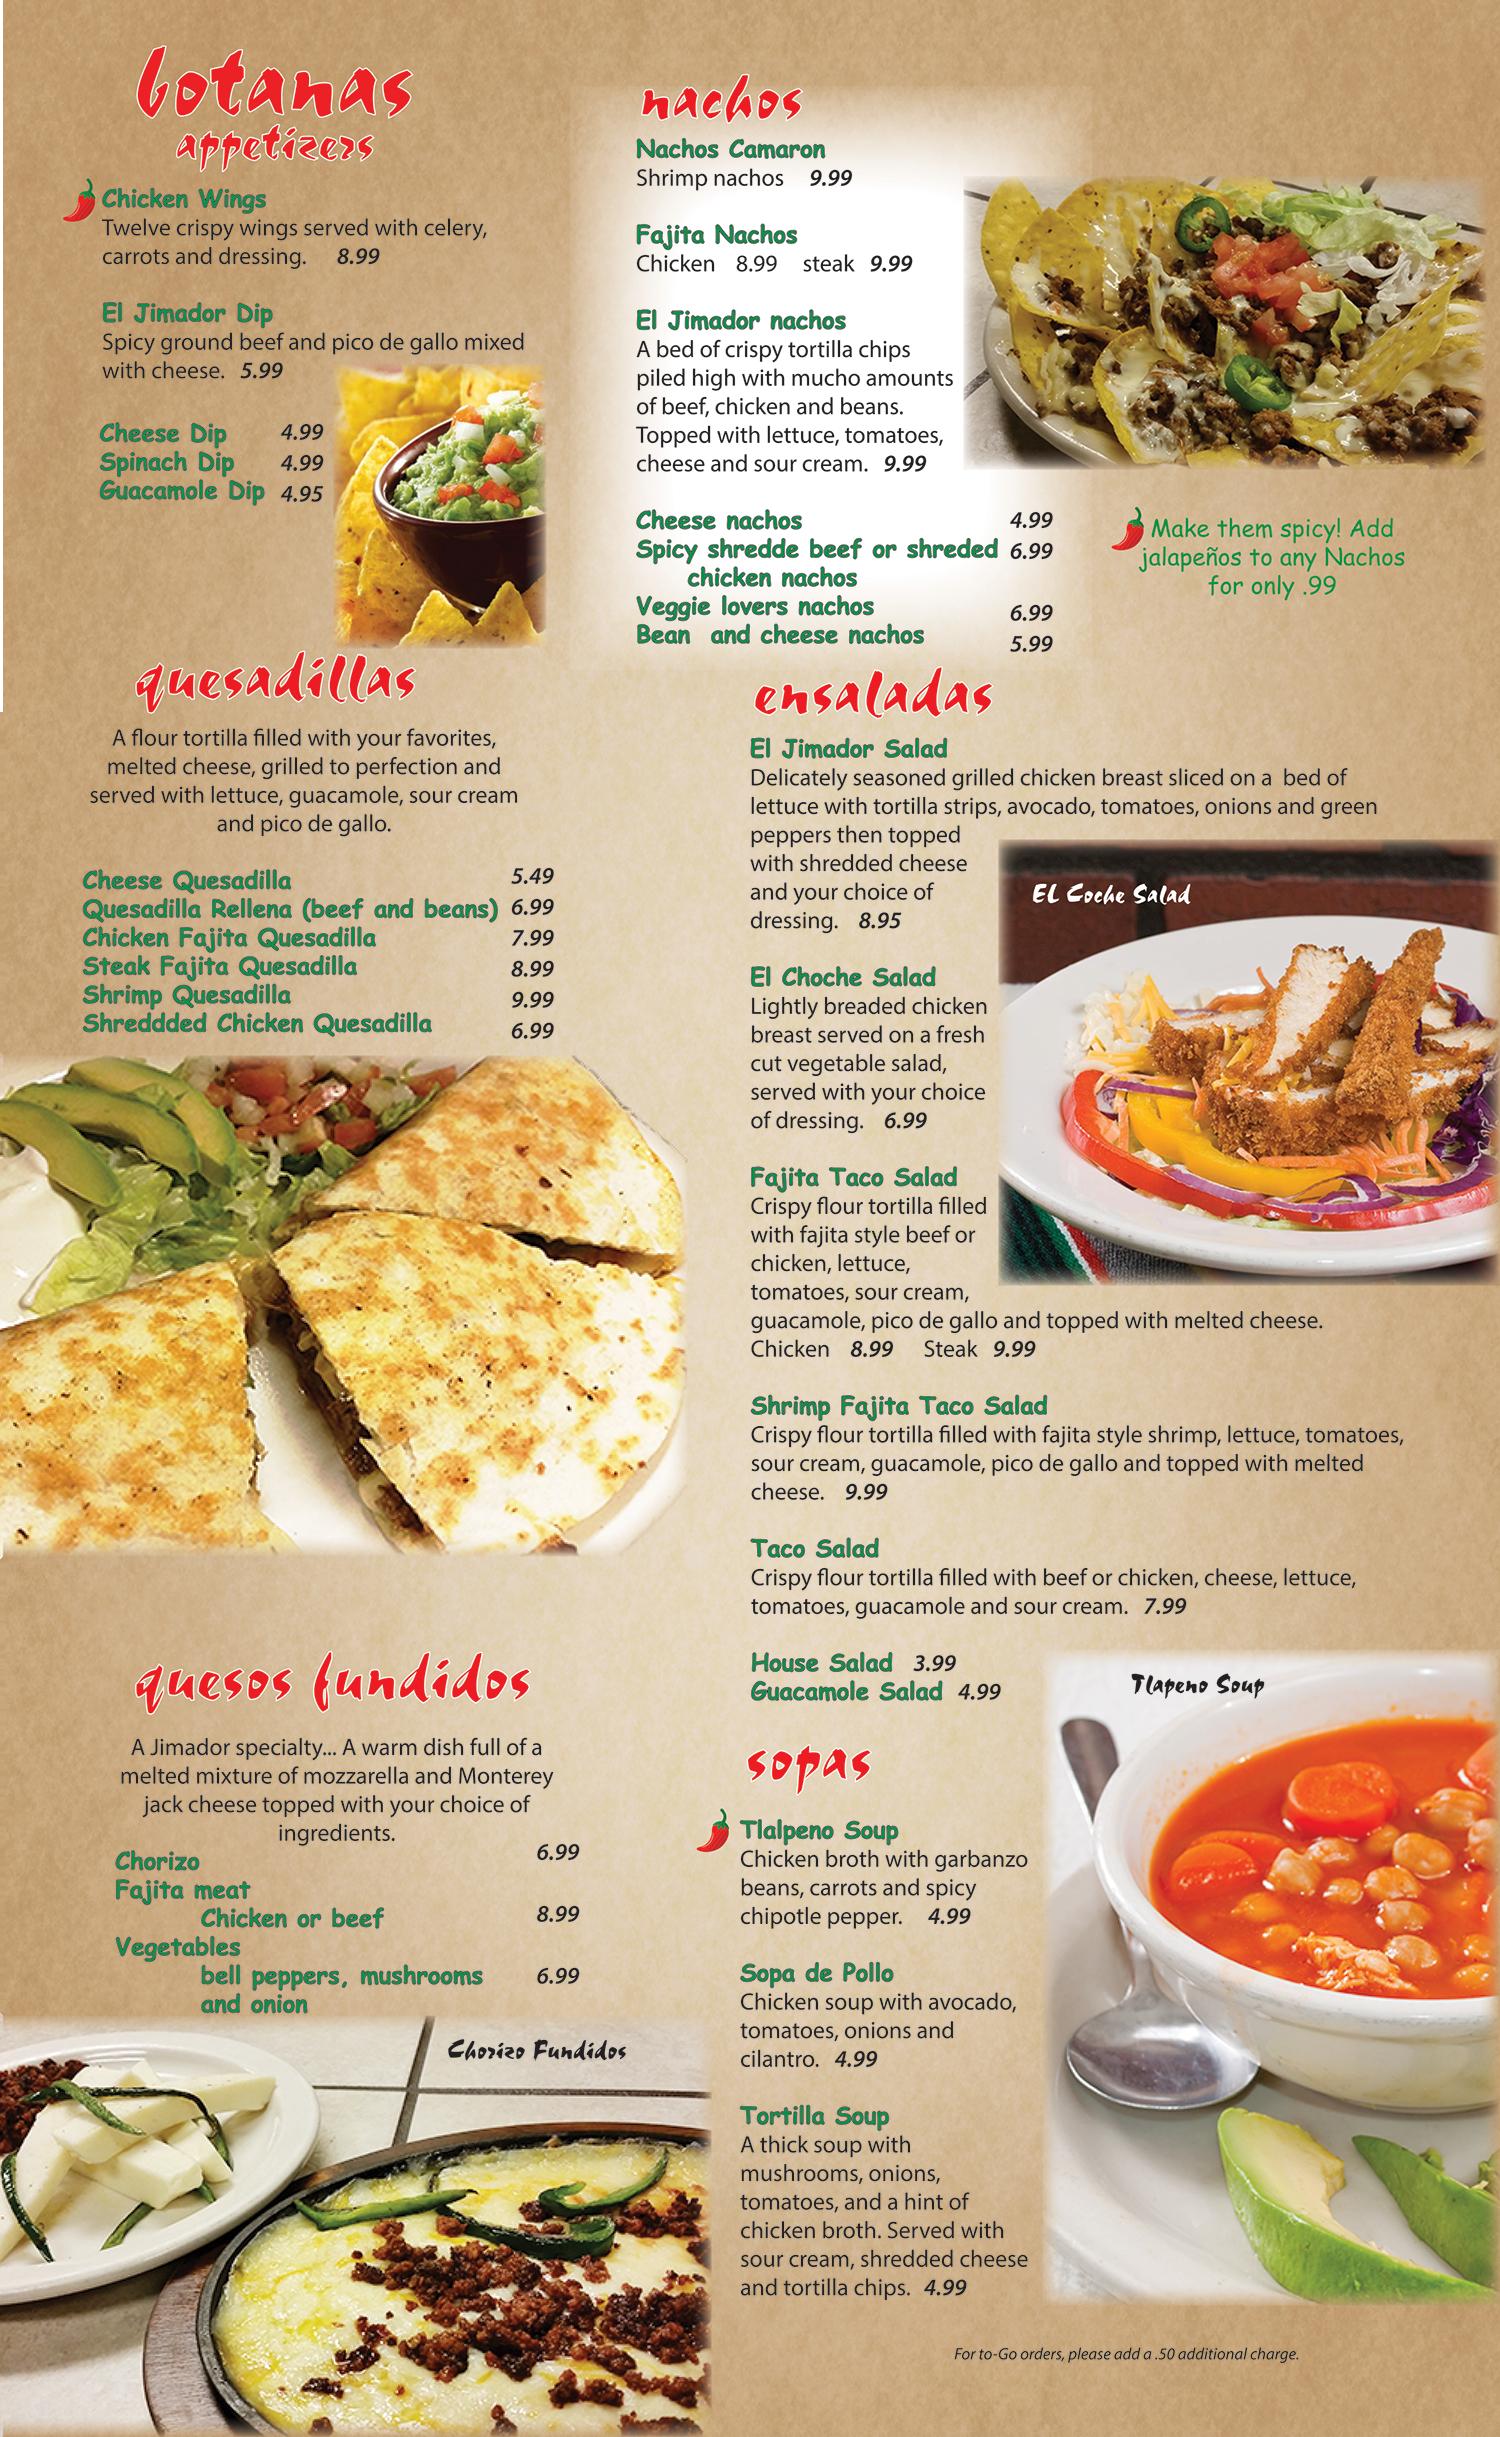 El Jimador menu